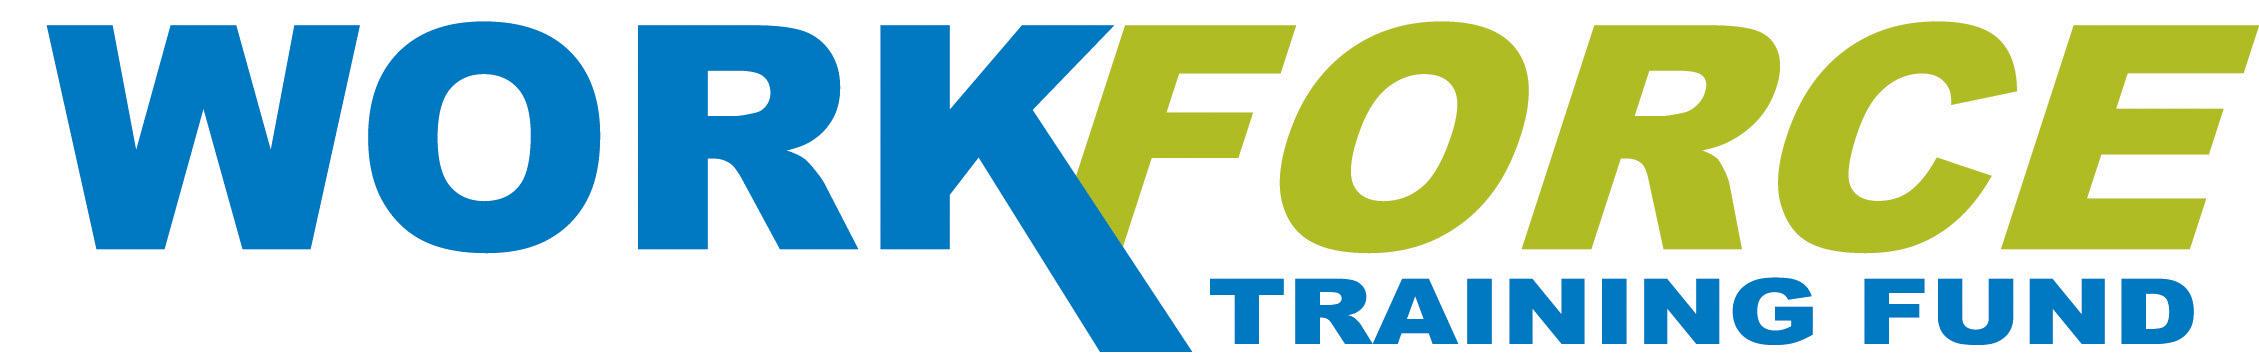 Workforce Training Fund Program Logo